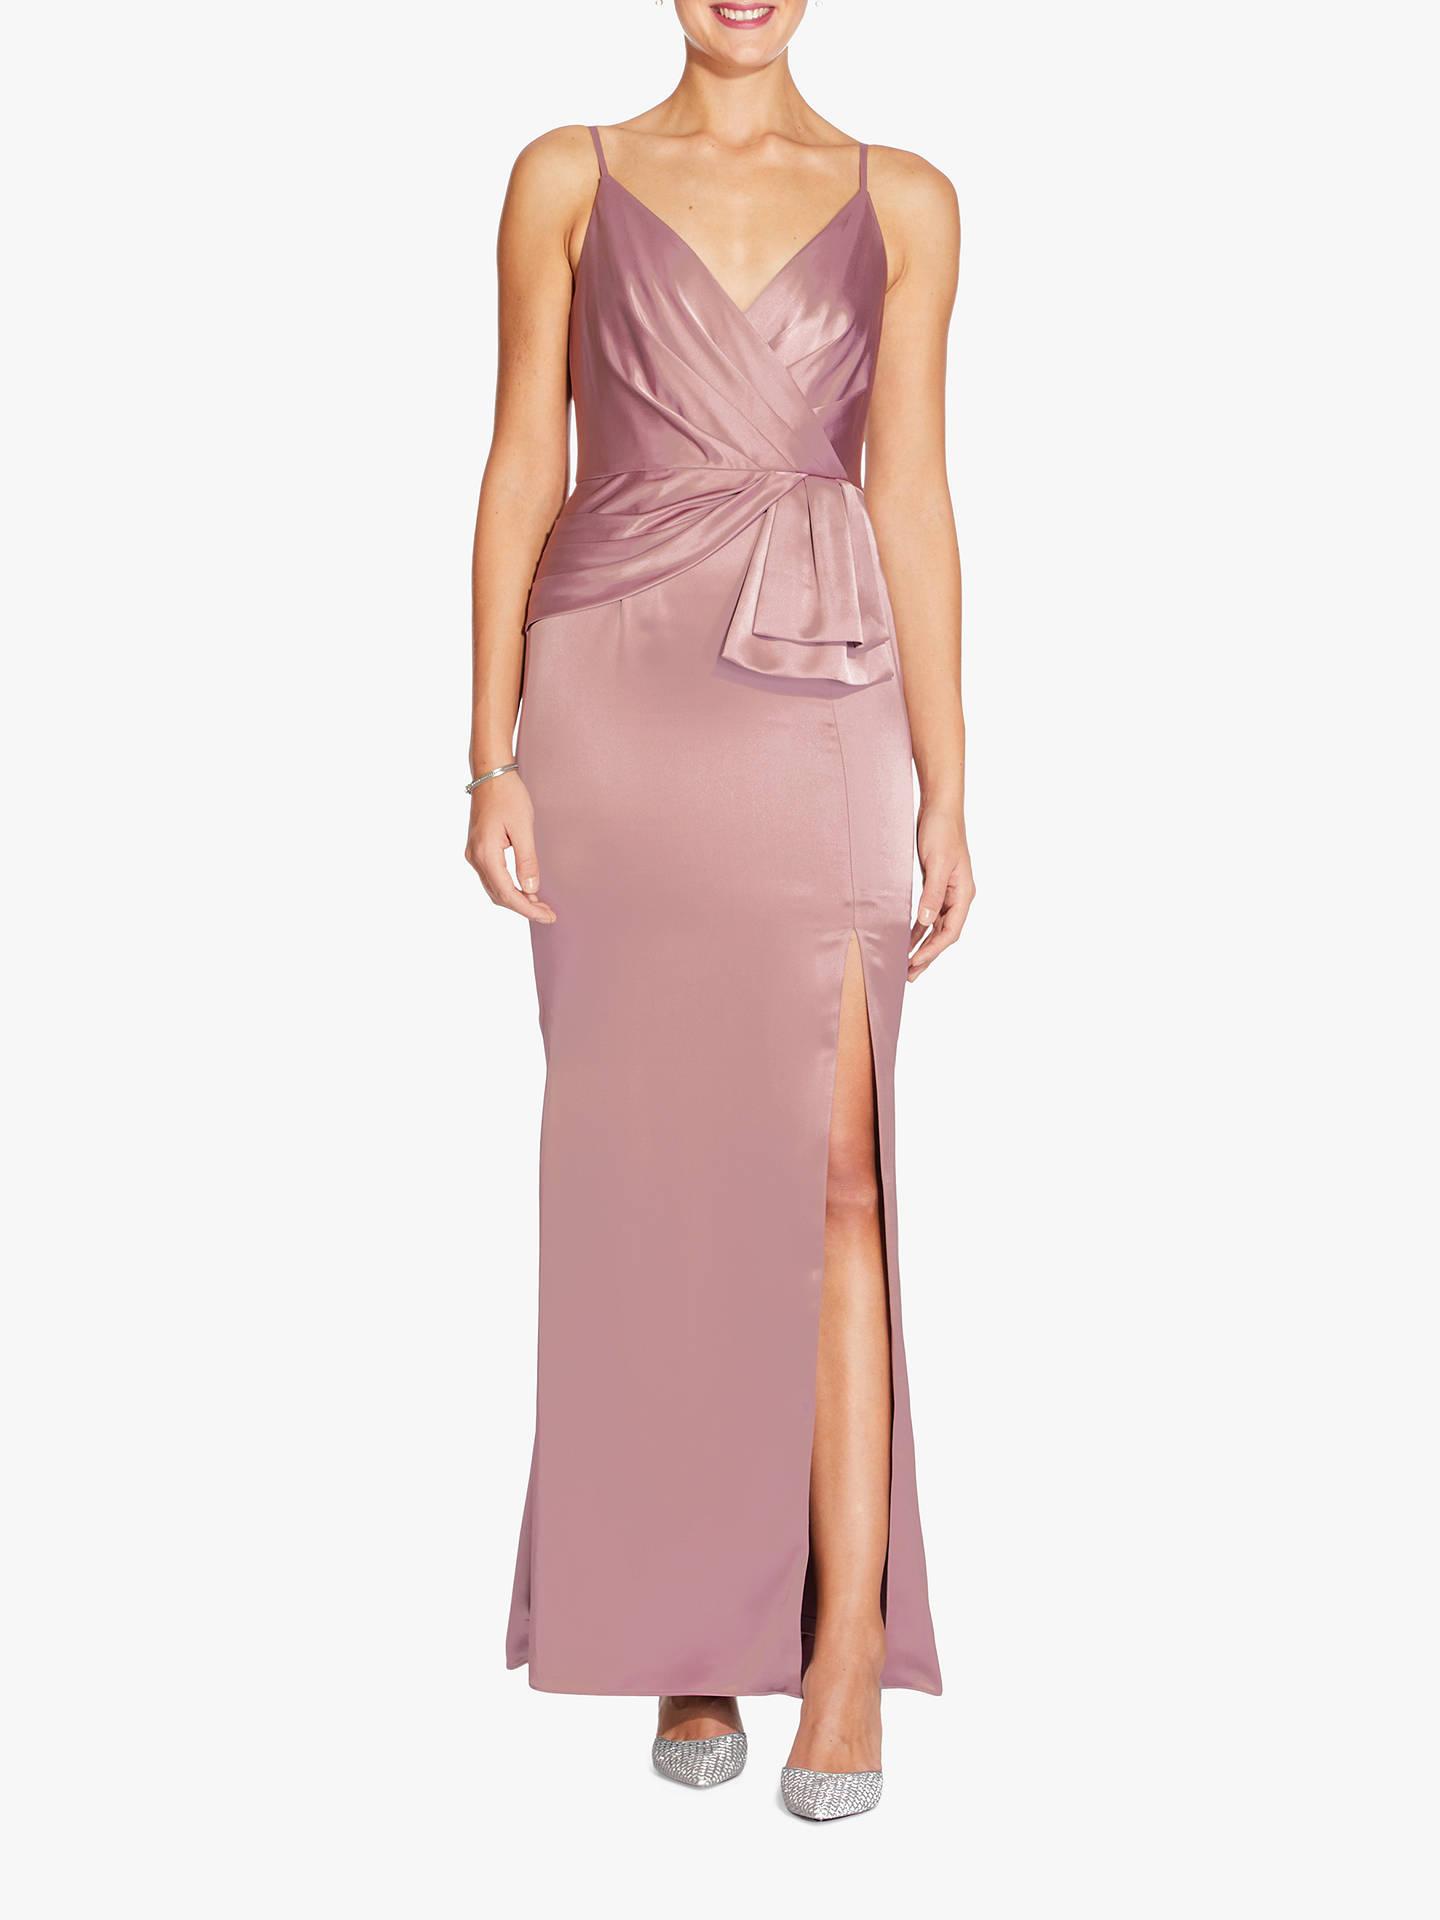 706ed1378f7 Adrianna Papell Light Satin Wrap Dress, Rose